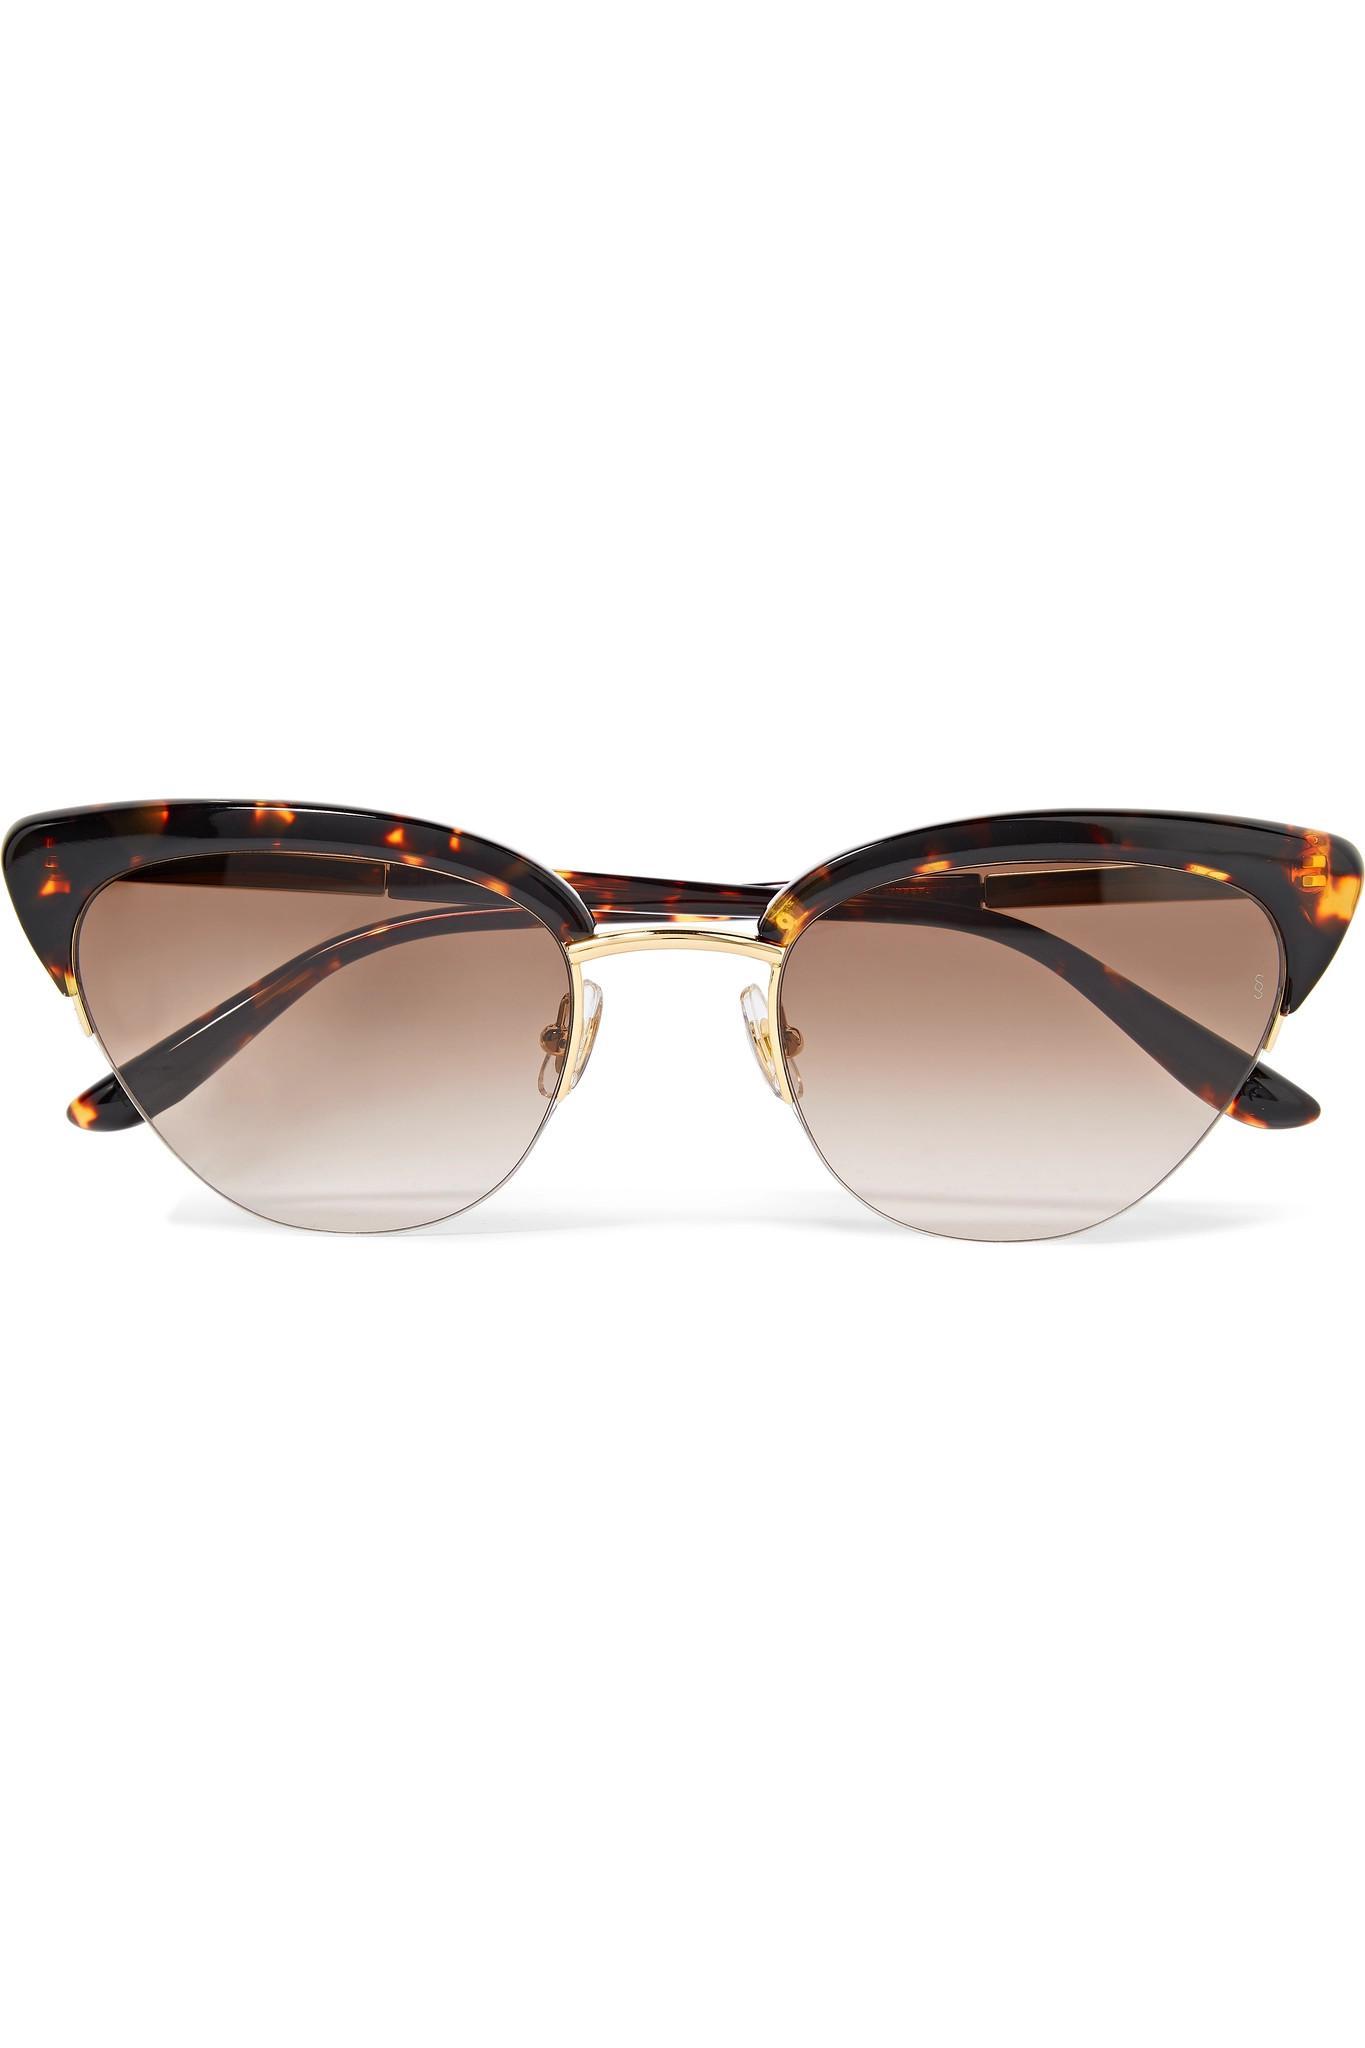 Piper Cat-eye Acetate Sunglasses - Peach Sunday Somewhere d4wpTooC